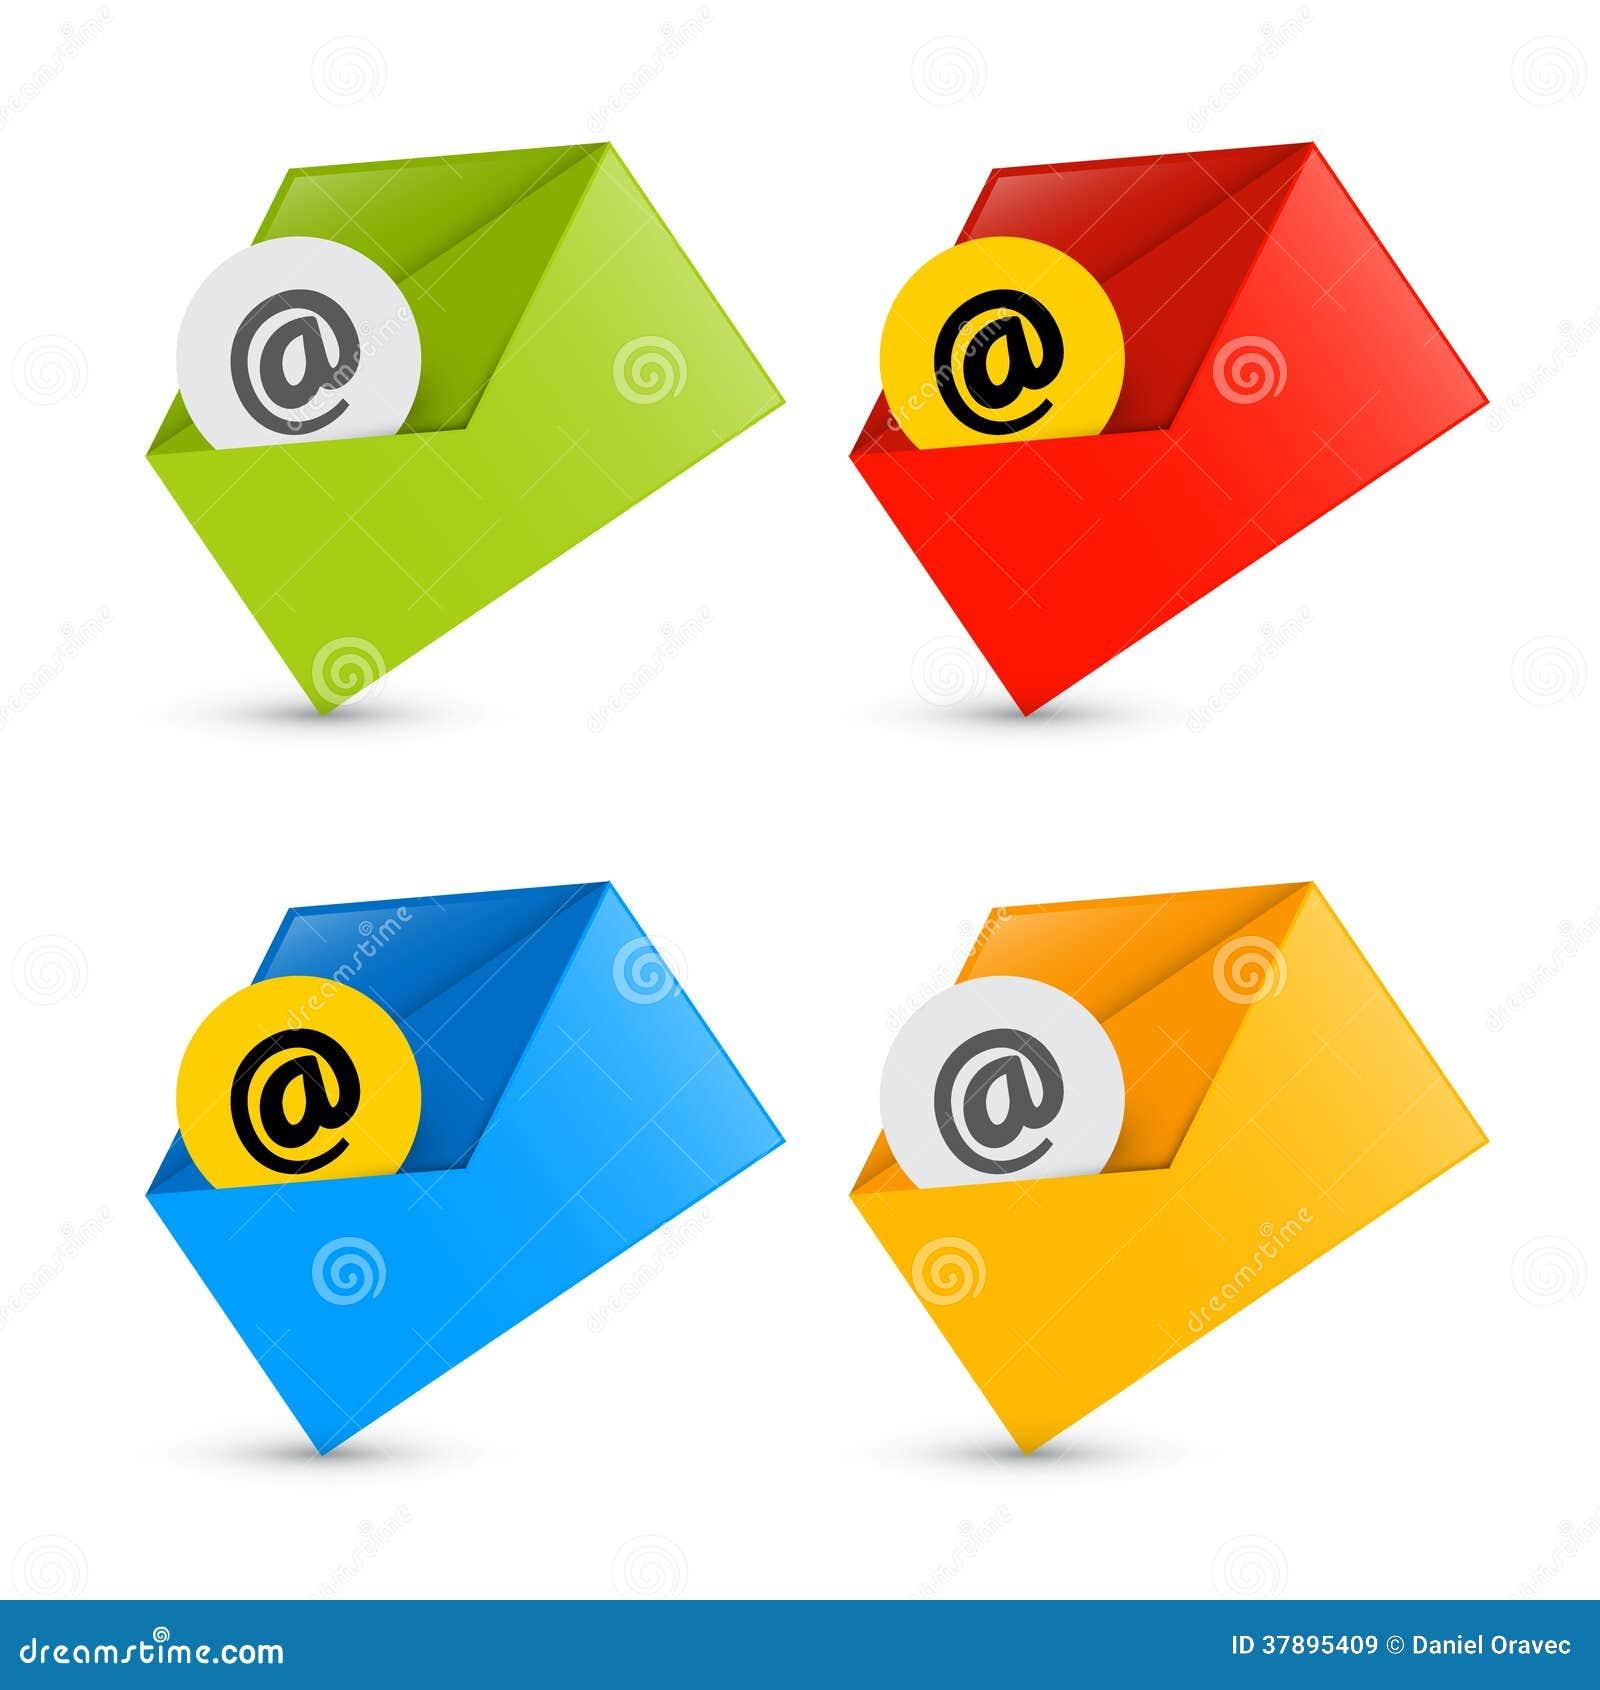 E-mail, E-mailpictogrammen, Geplaatste Enveloppictogrammen